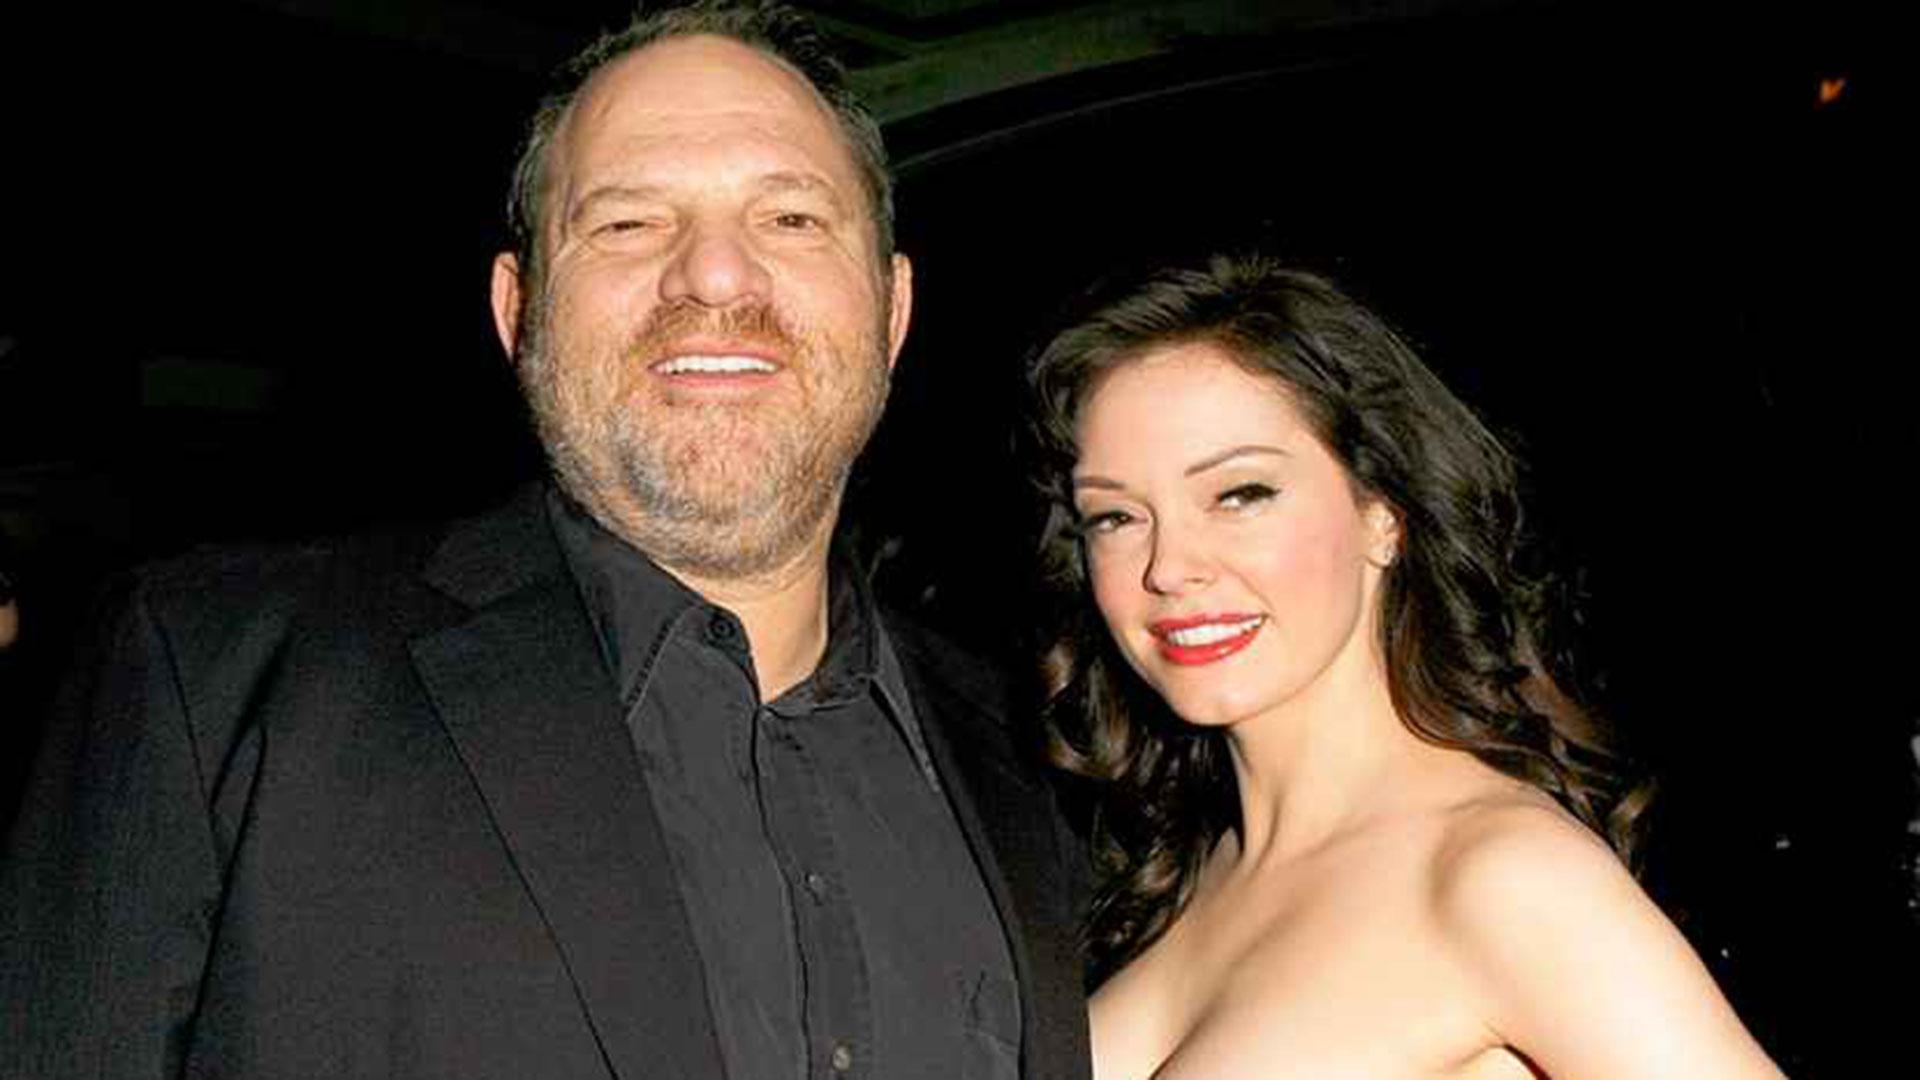 Rose McGowan denunció públicamente que Weinstein la violó